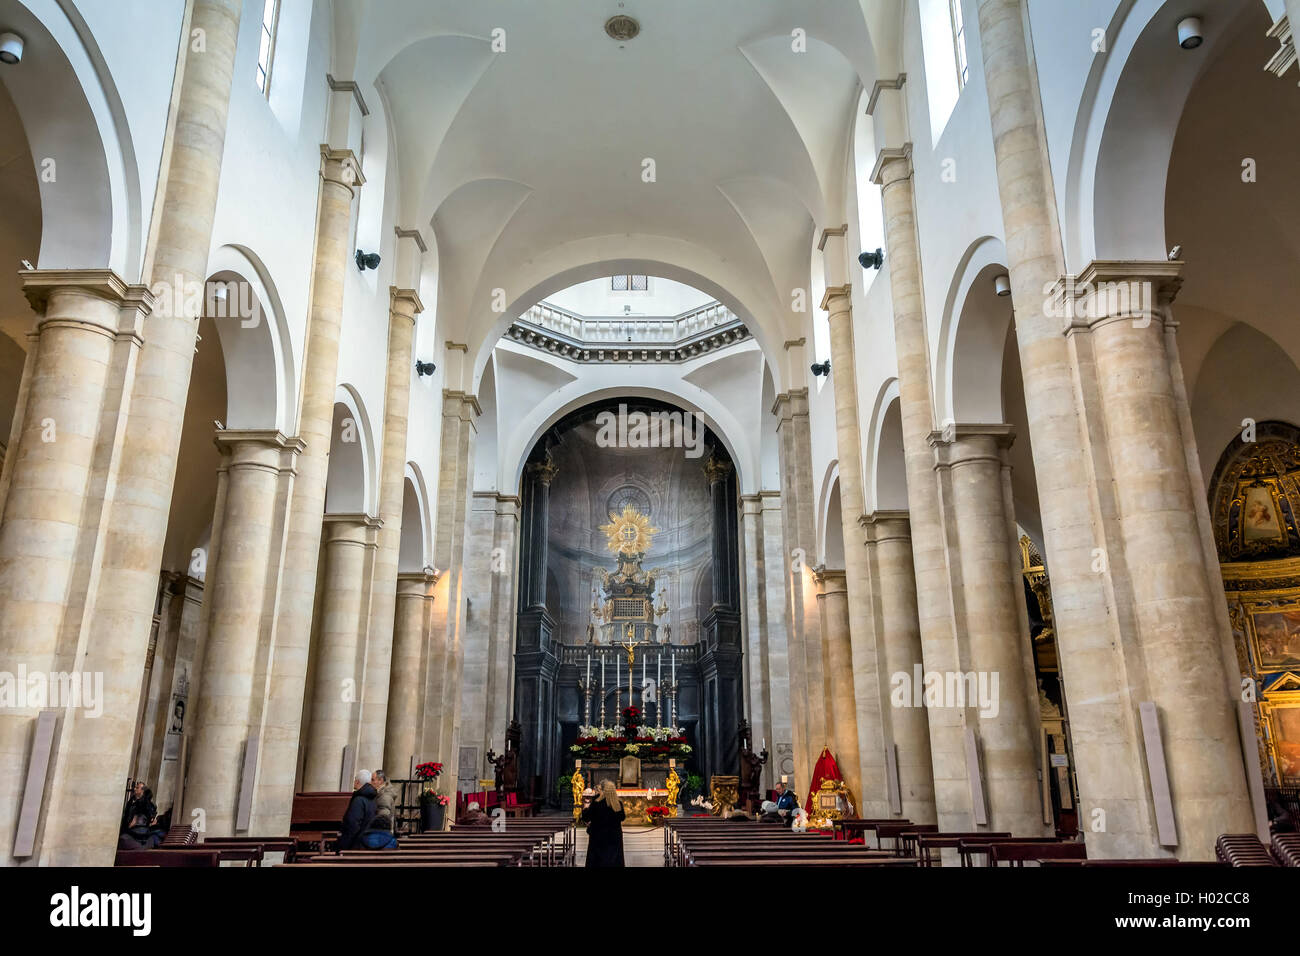 Interior of Turin Cathedral (Duomo di Torino), built in 1470. - Stock Image